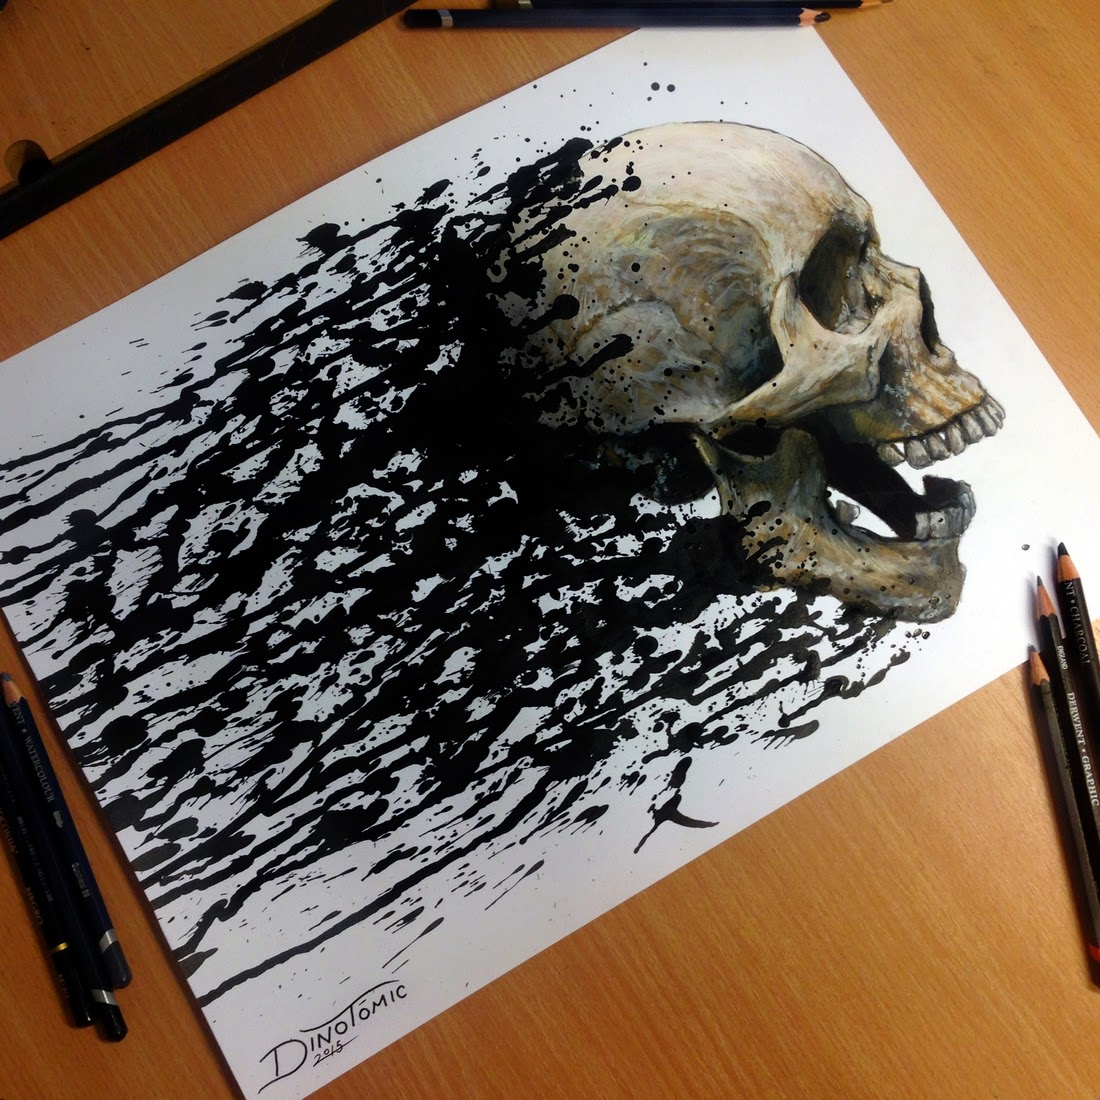 11-Skull-Splatter-Dino-Tomic-AtomiccircuS-Mastering-Art-in-Eclectic-Drawings-www-designstack-co